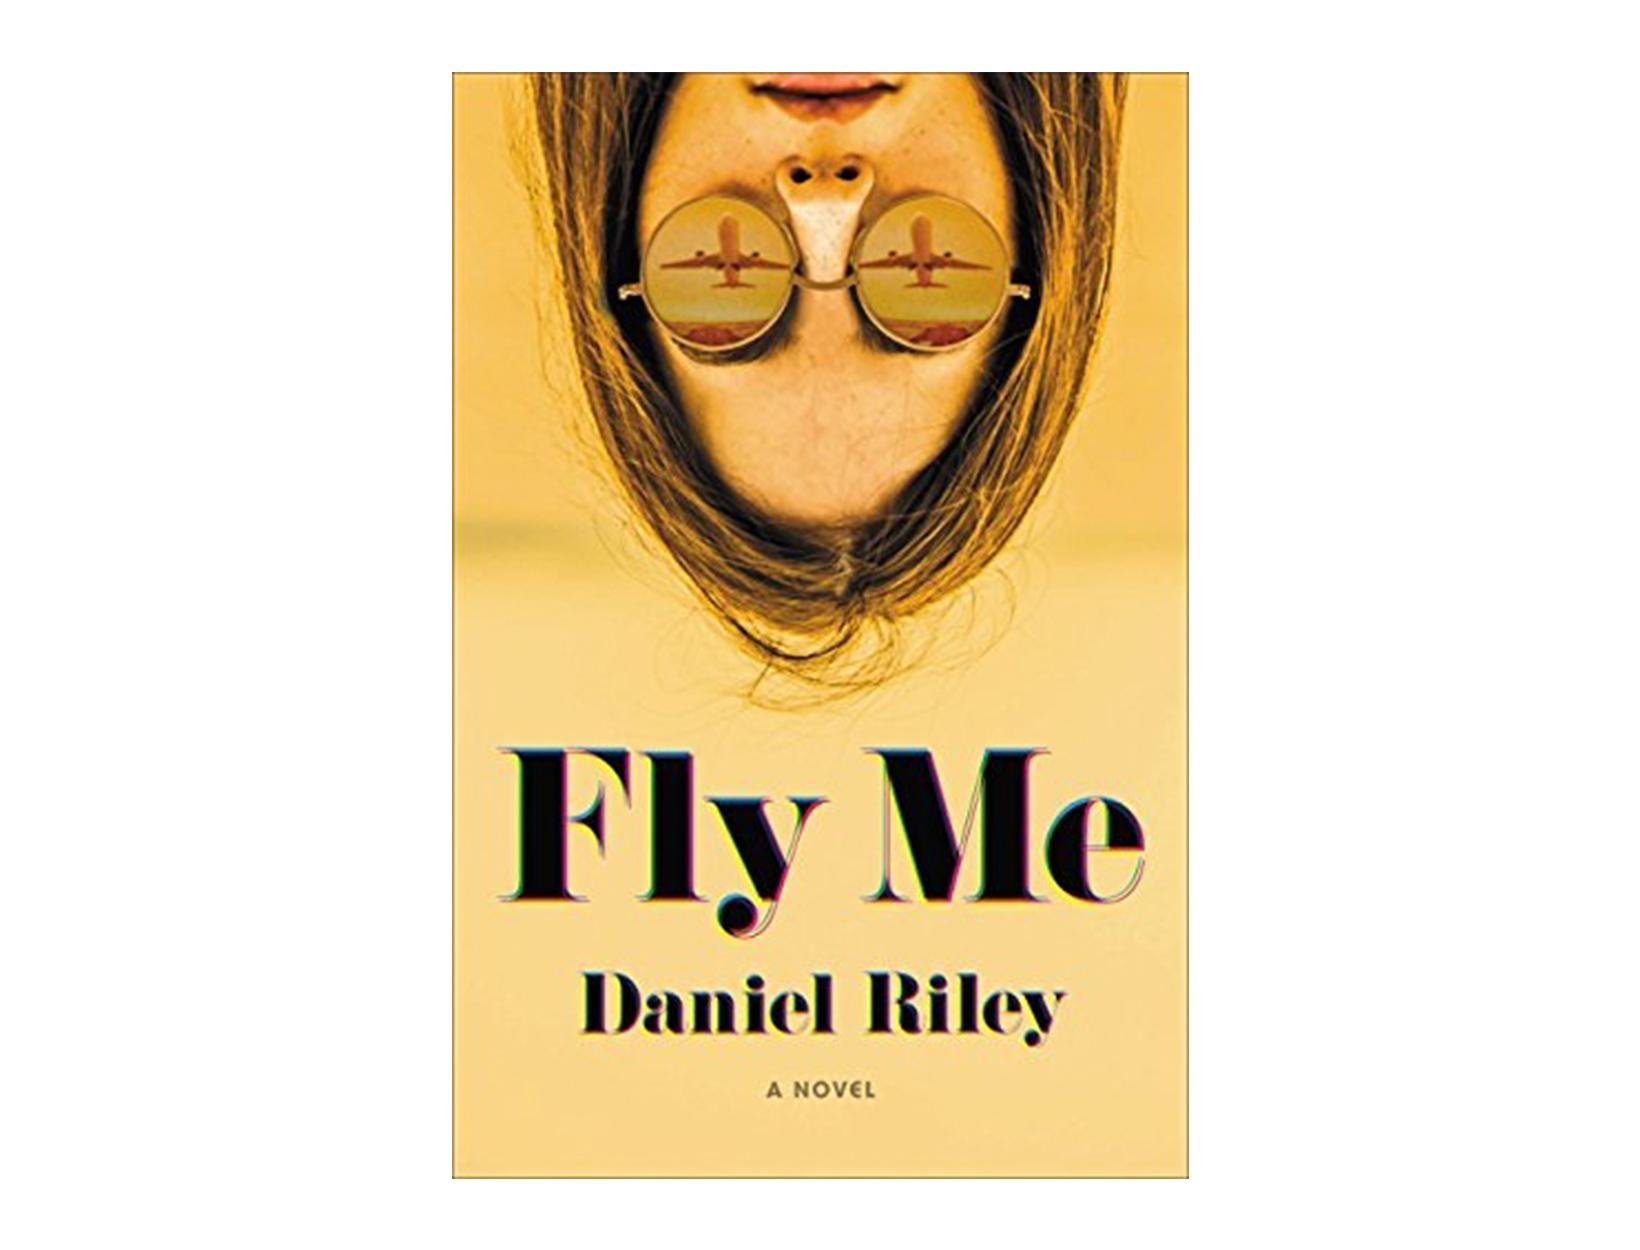 <em>Daniel Riley